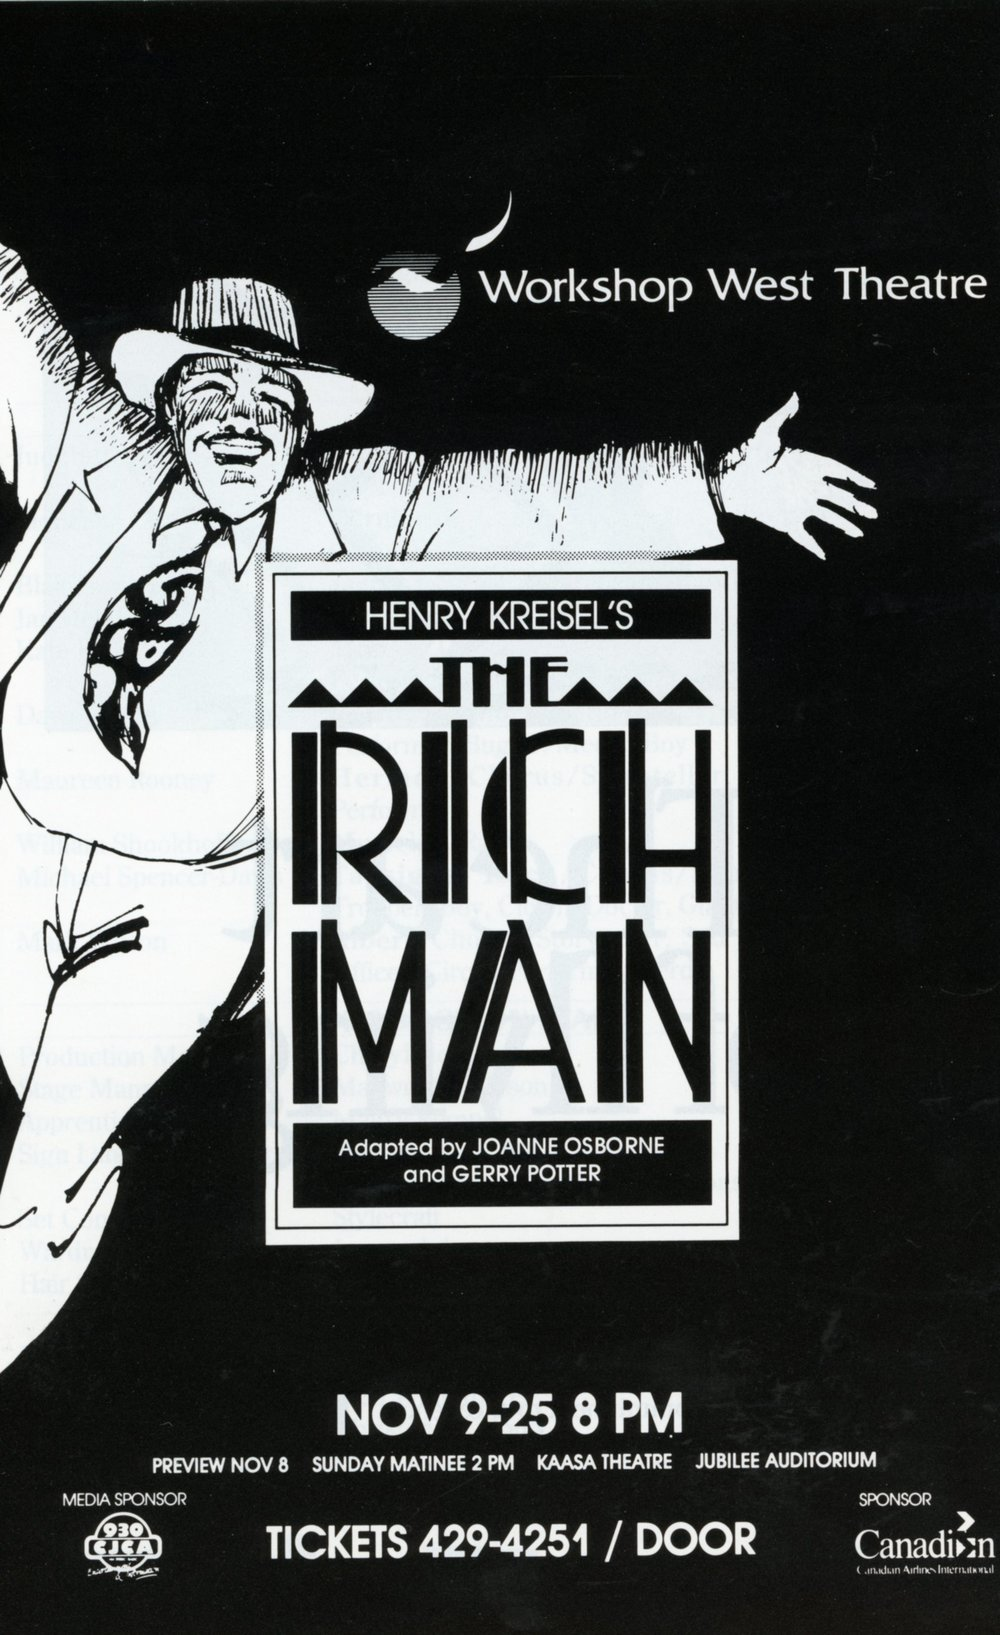 The Rich Man (November,1990)-Program Cover JPEG.jpg